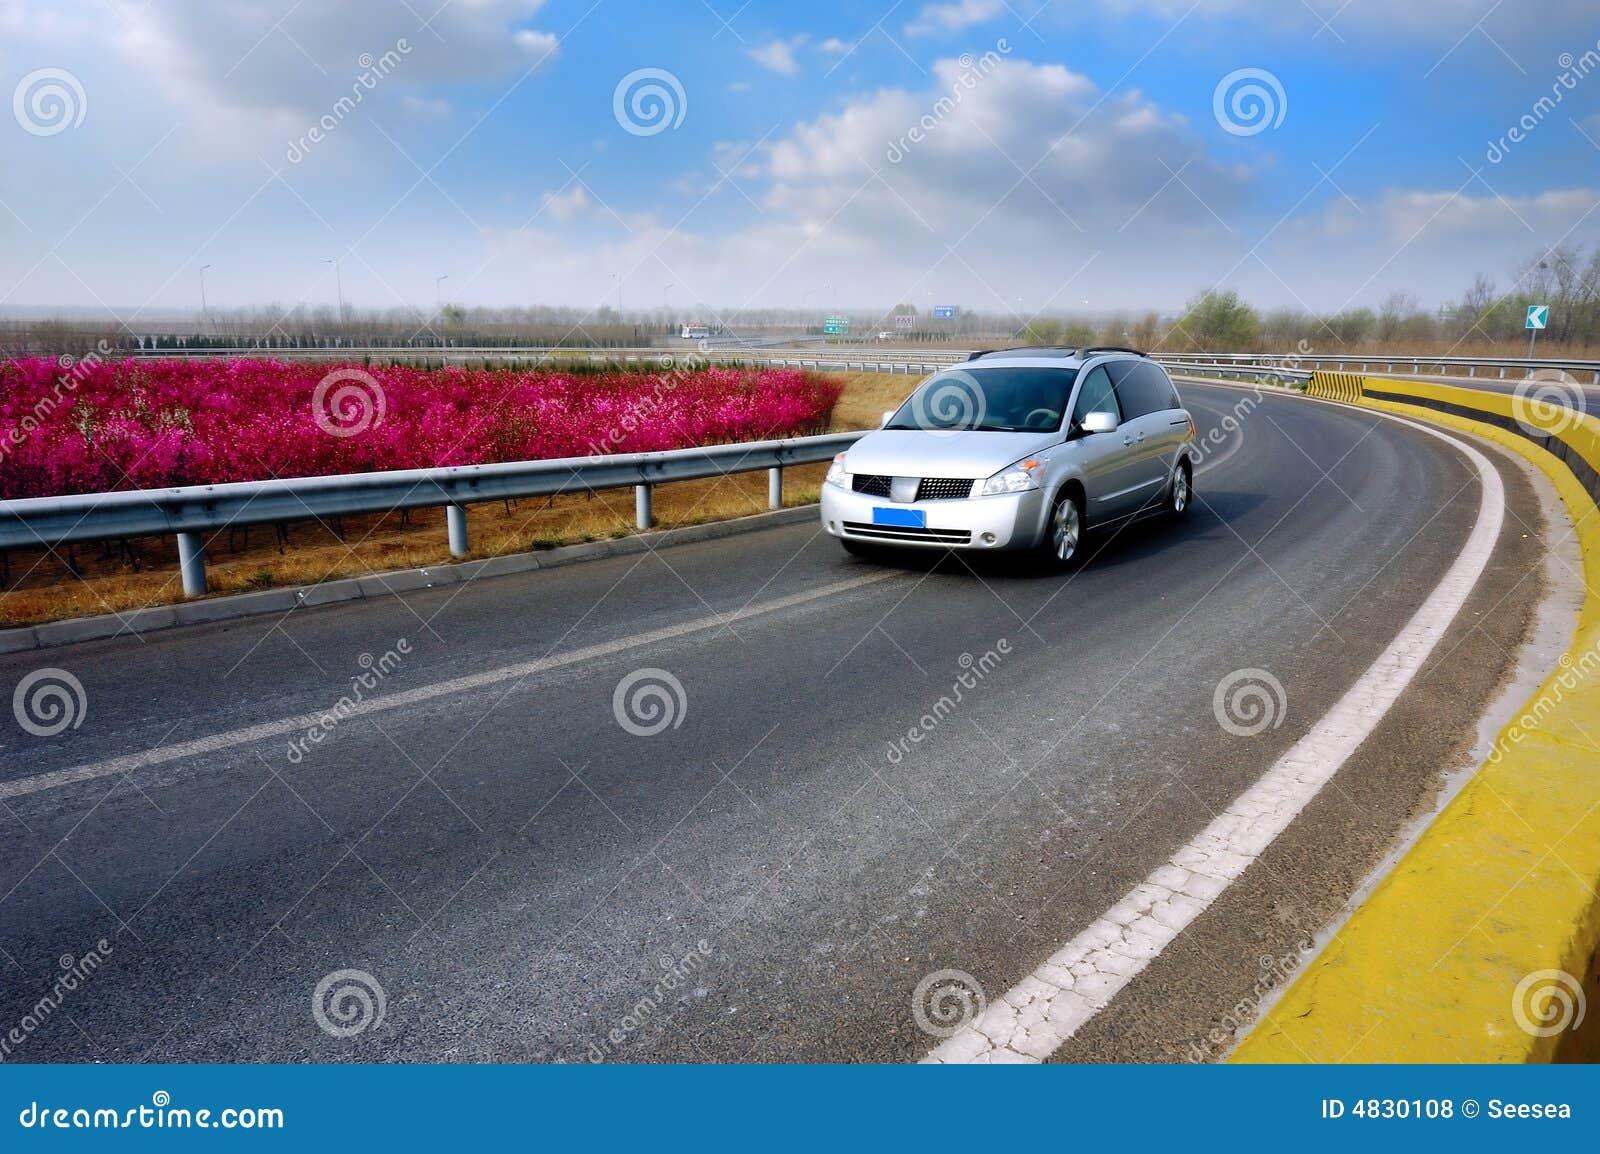 Estate car on the highway